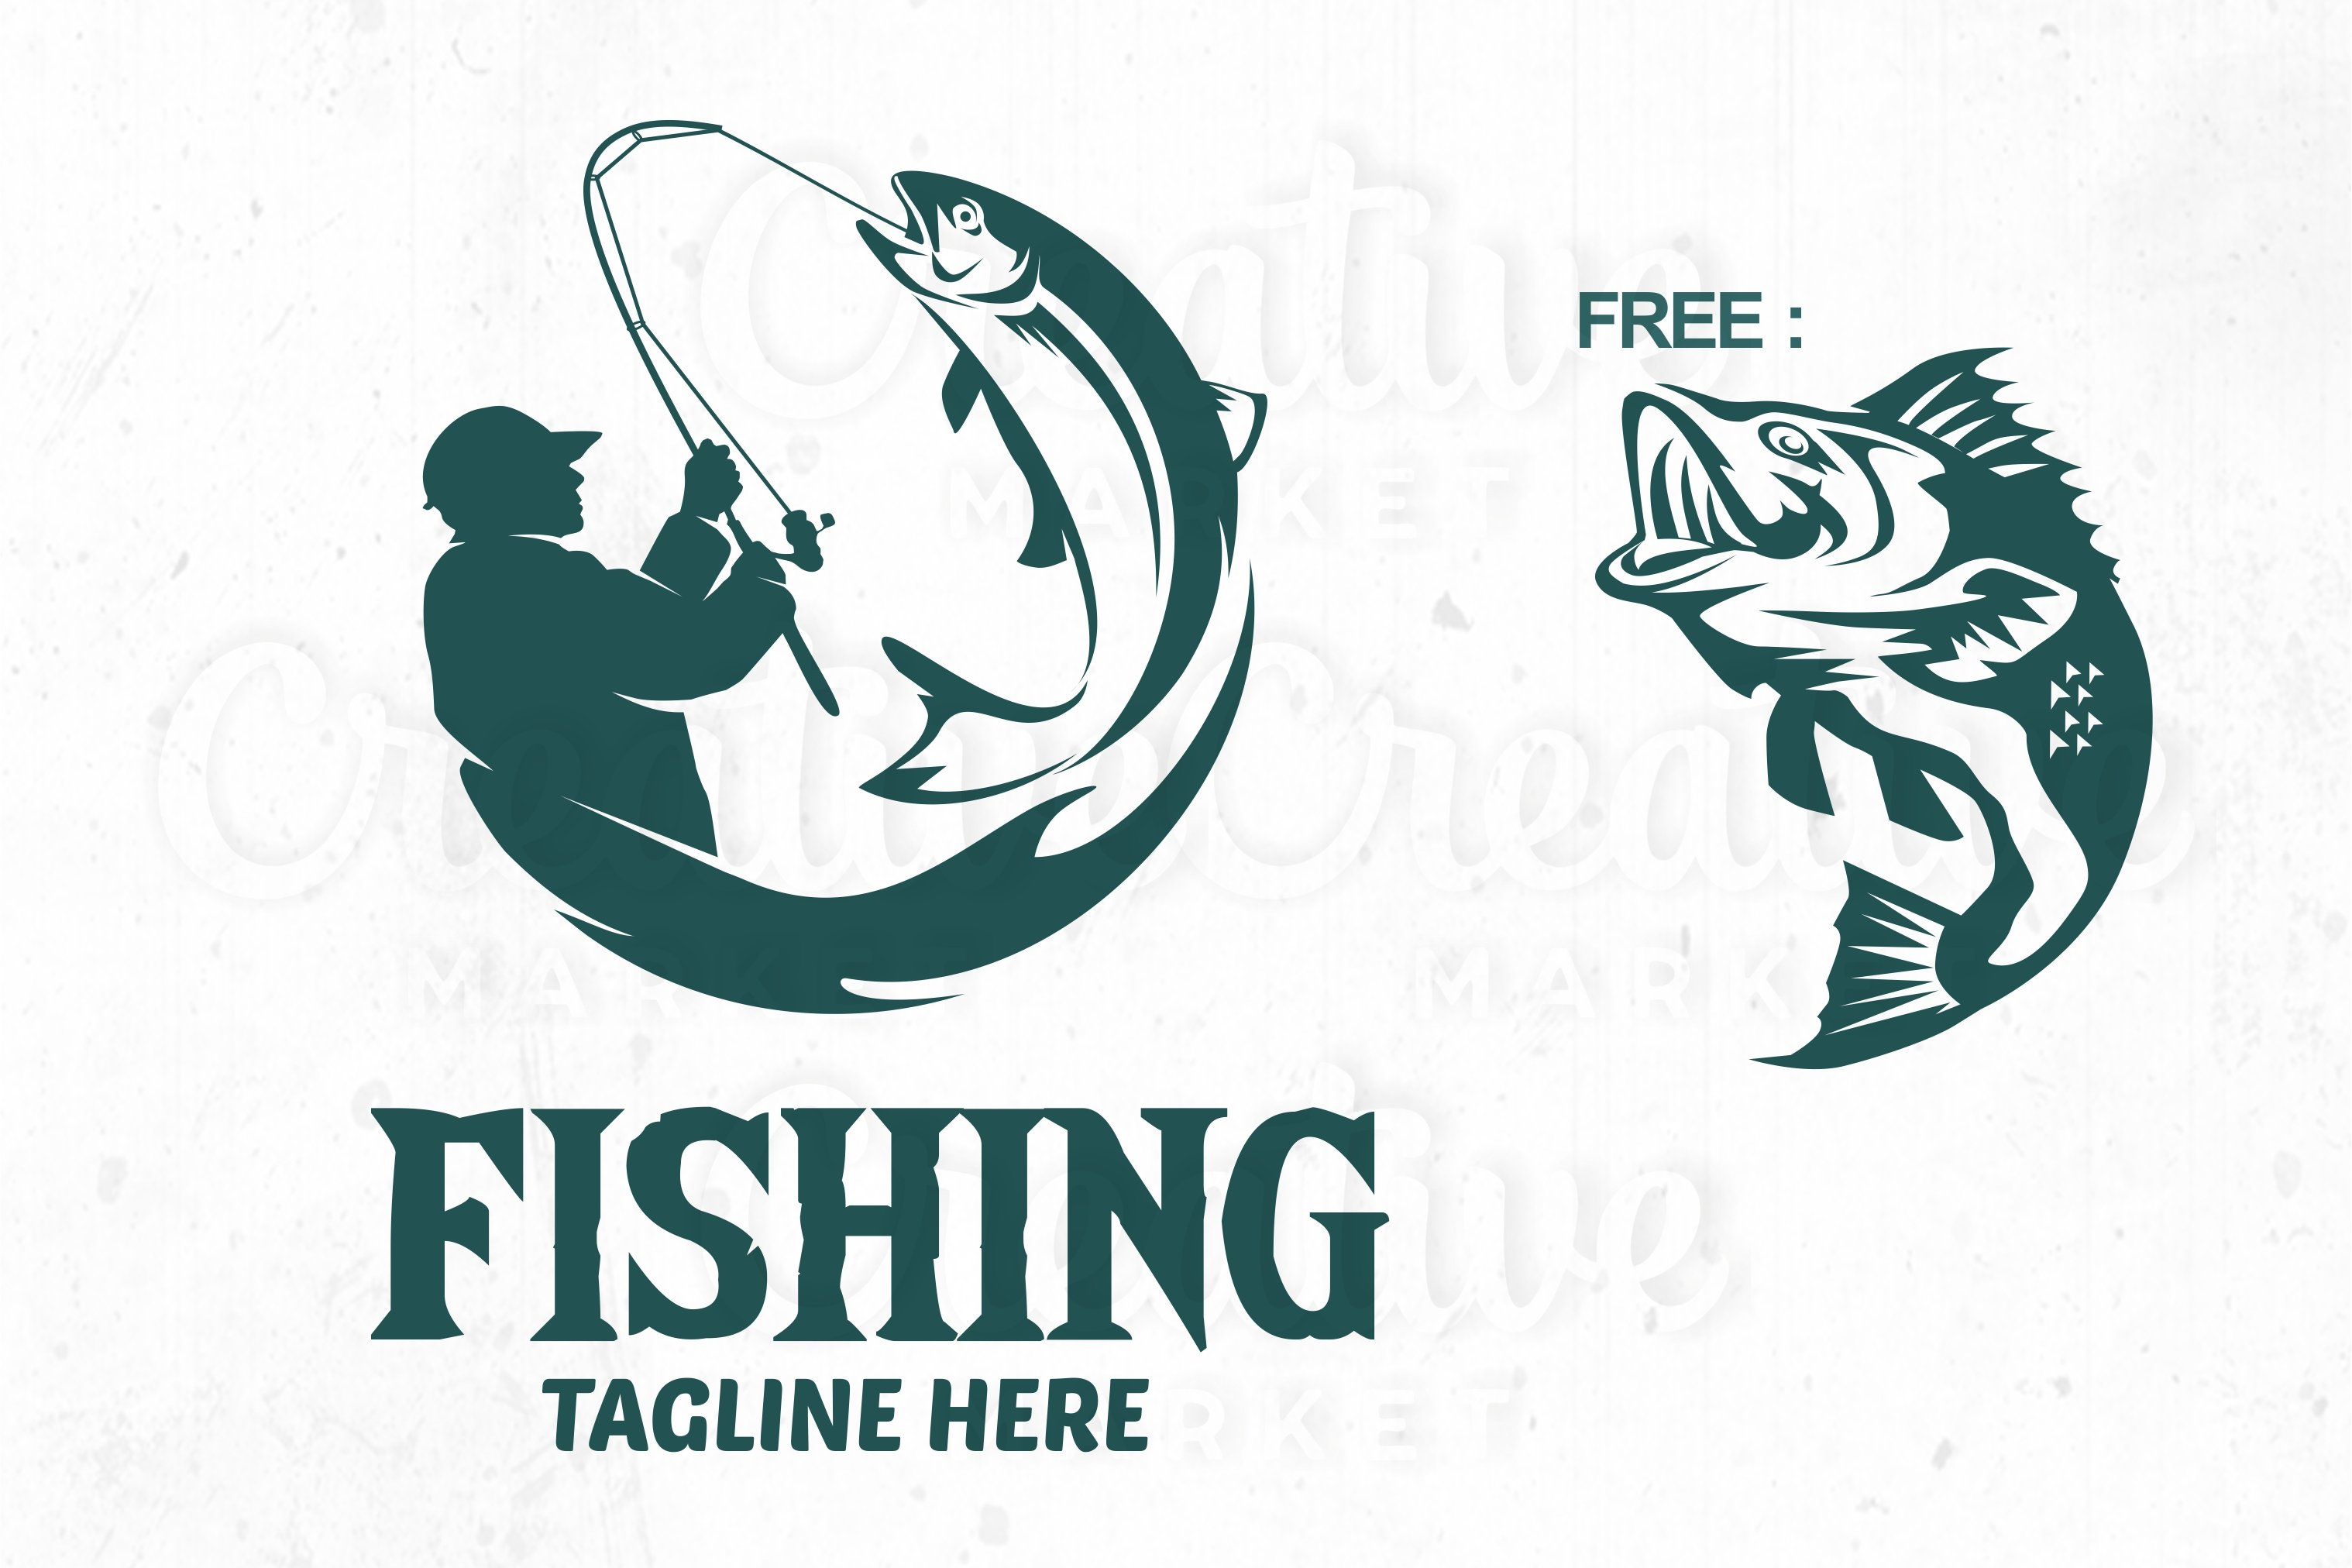 Fish logo pictures - photo#32